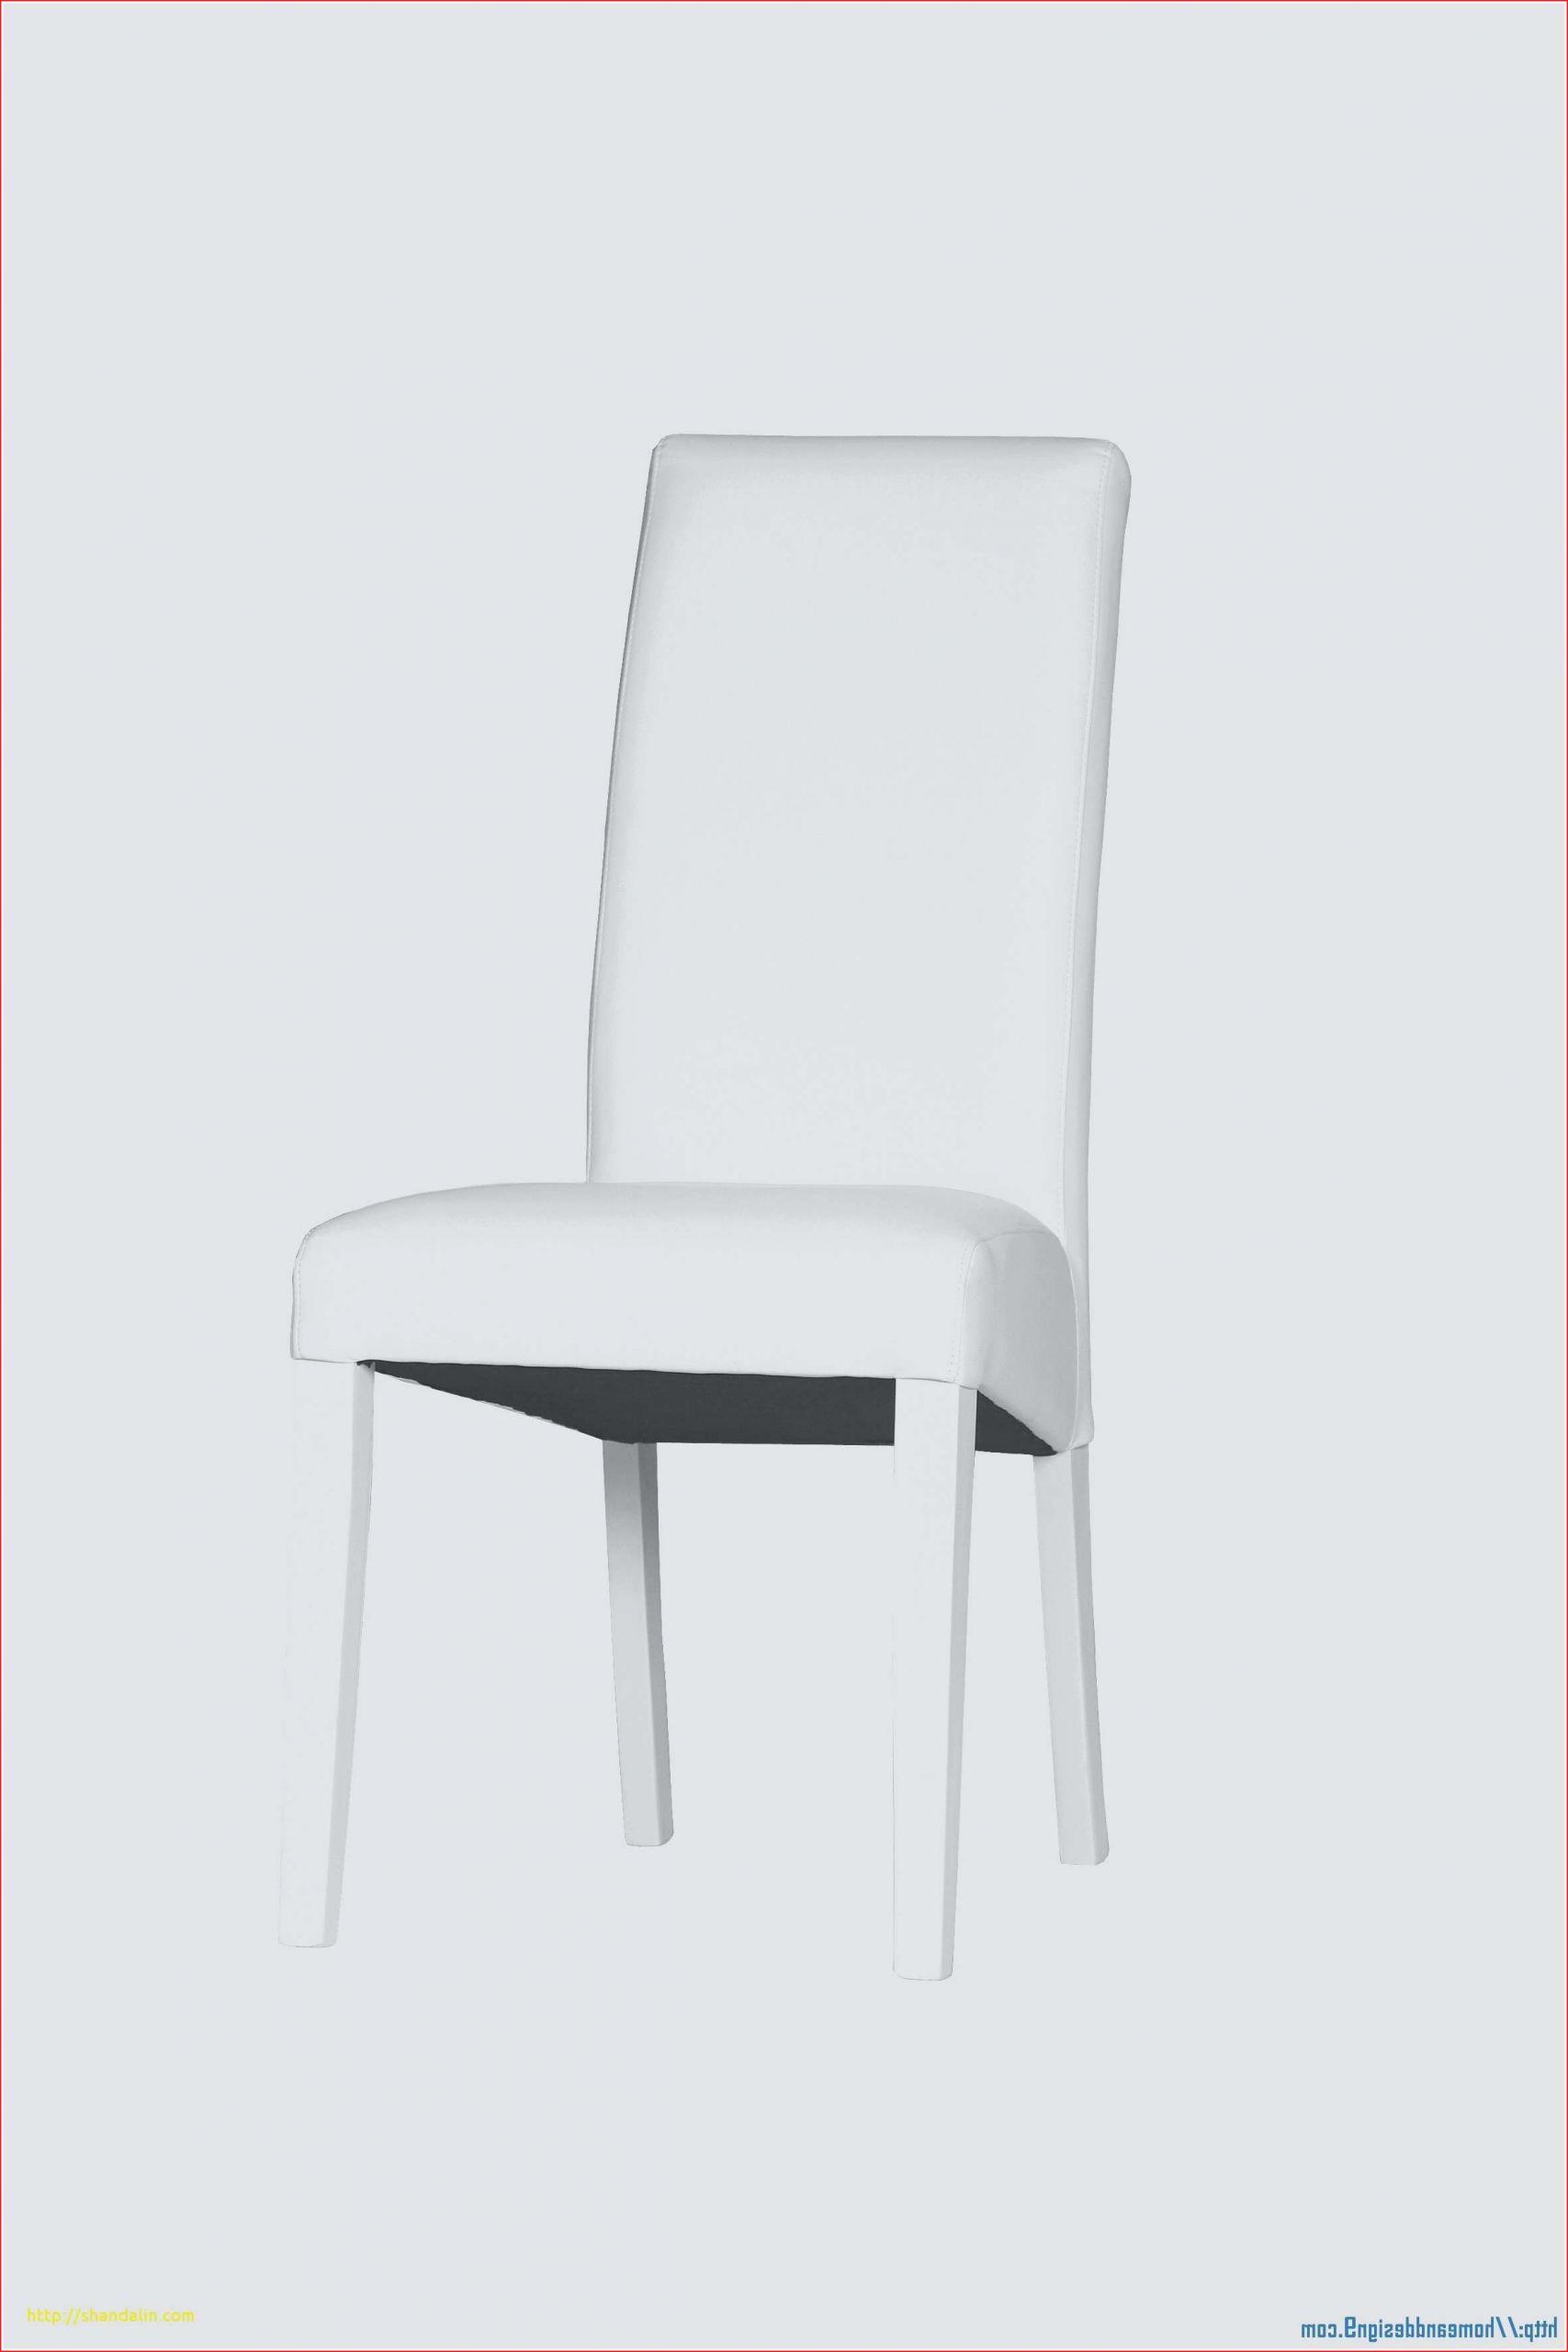 chaise horeca chaise de cuisine rouge of chaise horeca